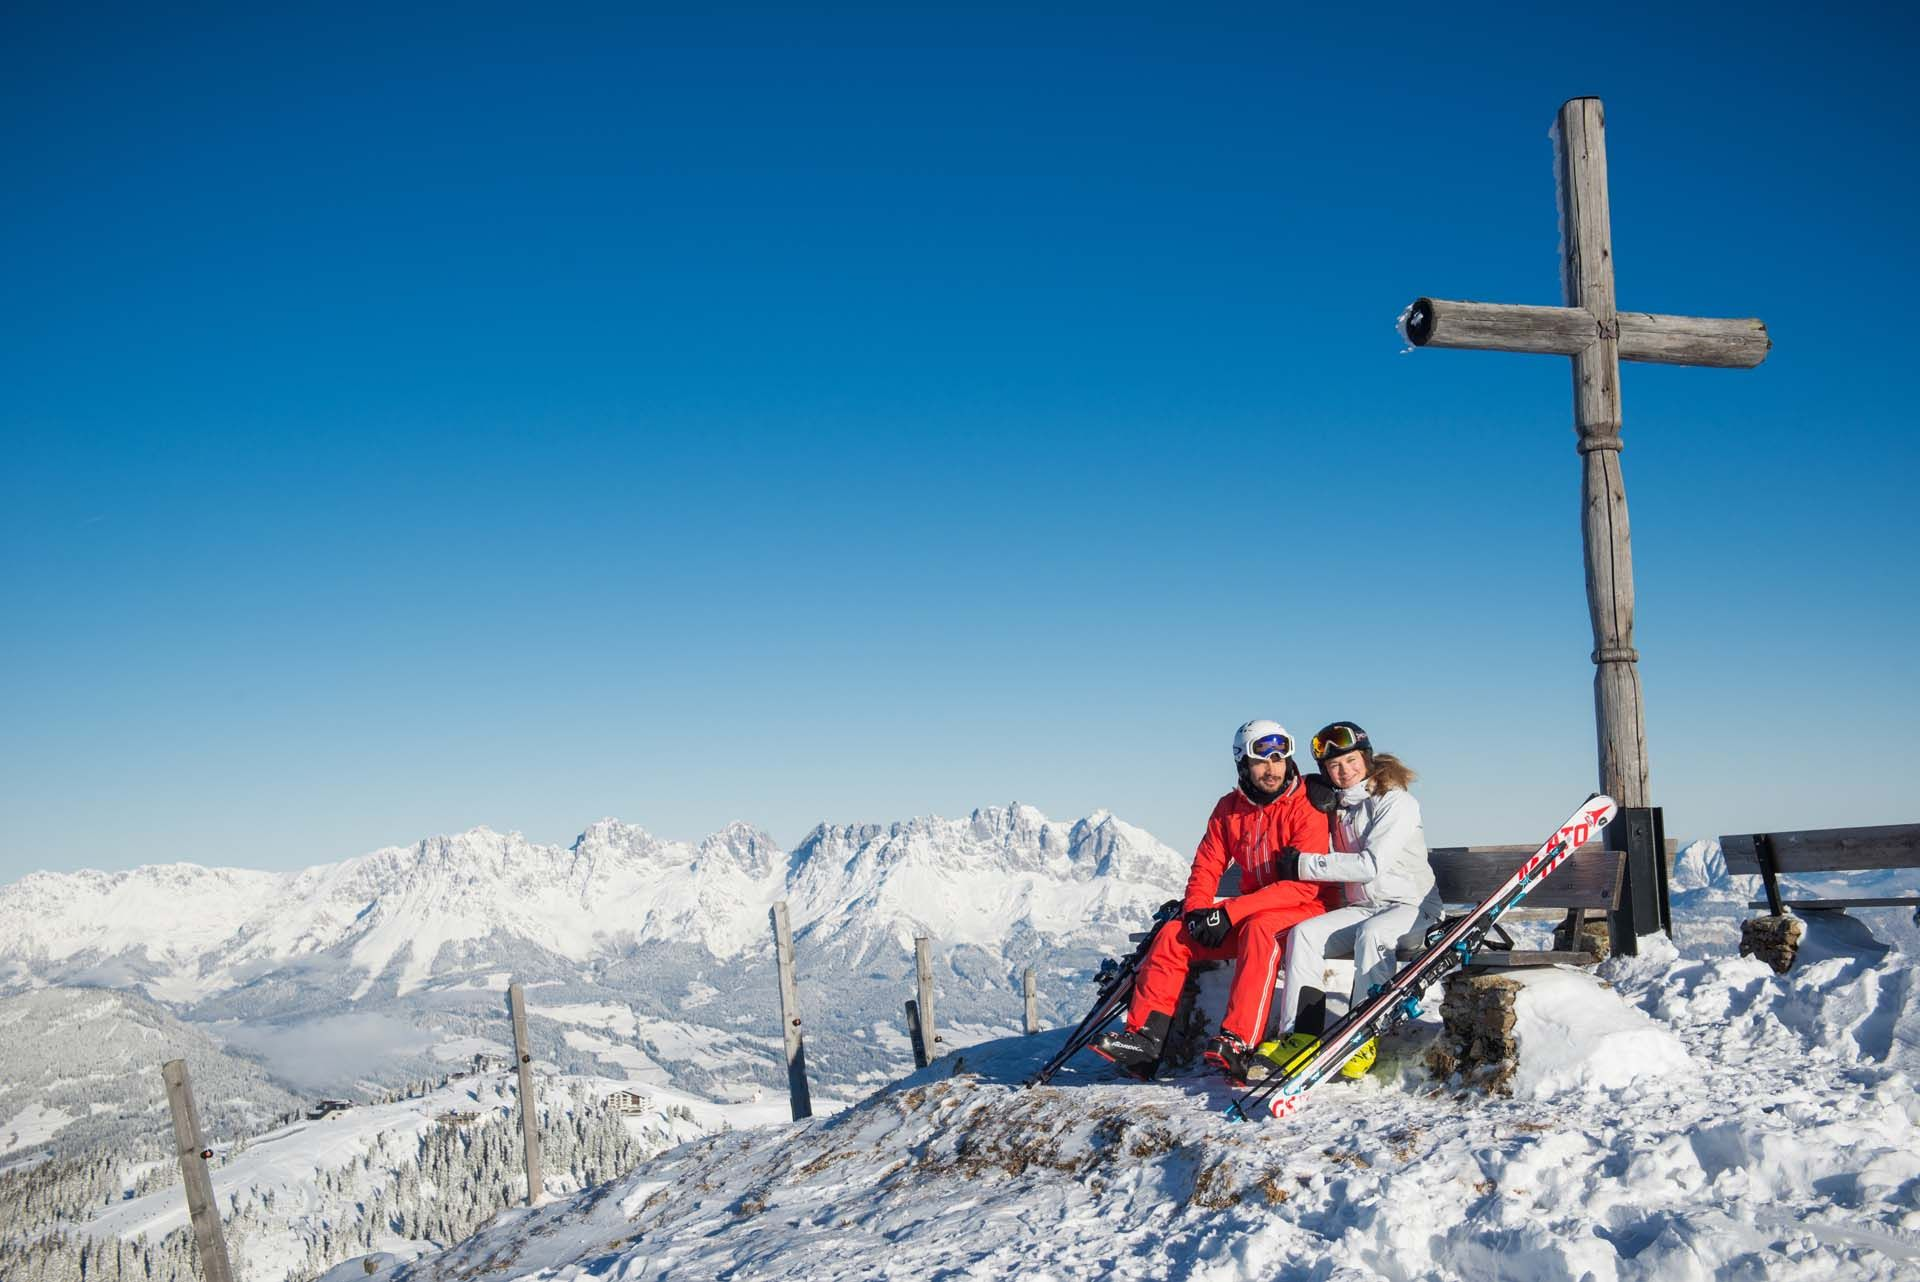 https://www.gasthof-melkalm.at/uploads/MxYja2KR/767x0_2560x0/ski-alpin-c-michael-werlberger014.jpg